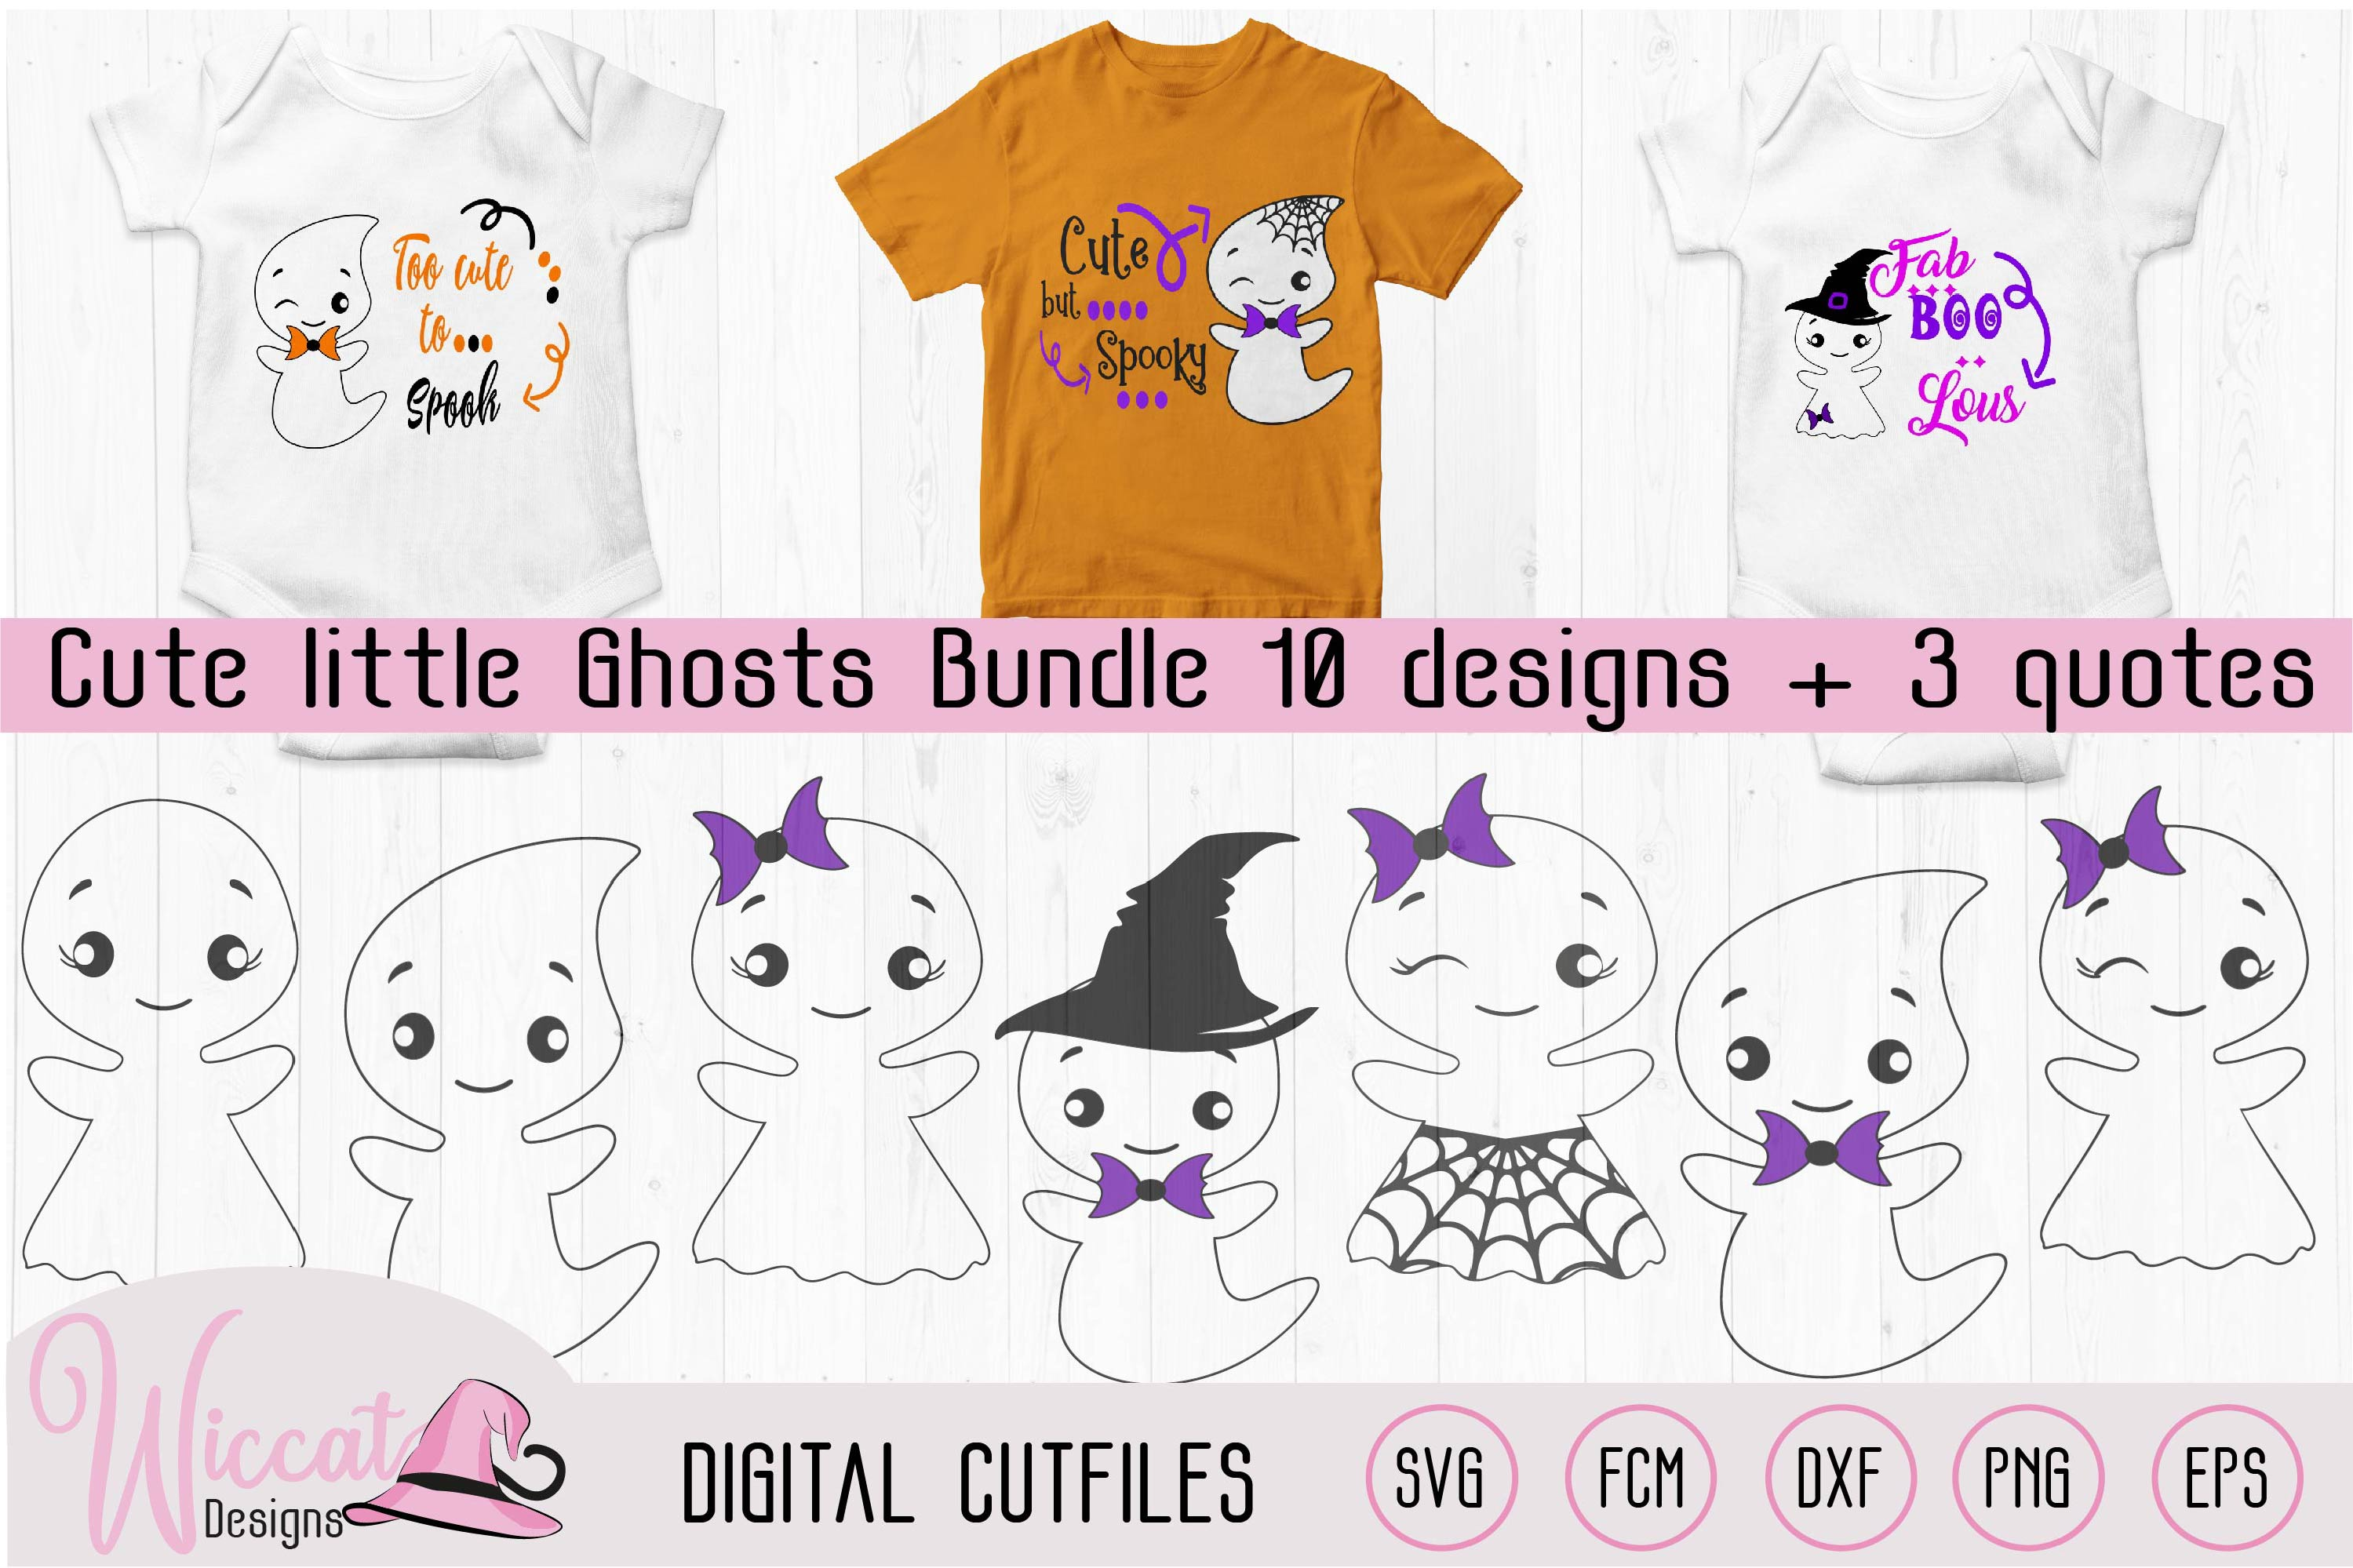 Cute little ghost bundle, scanncut, cricut, vinyl craft example image 1